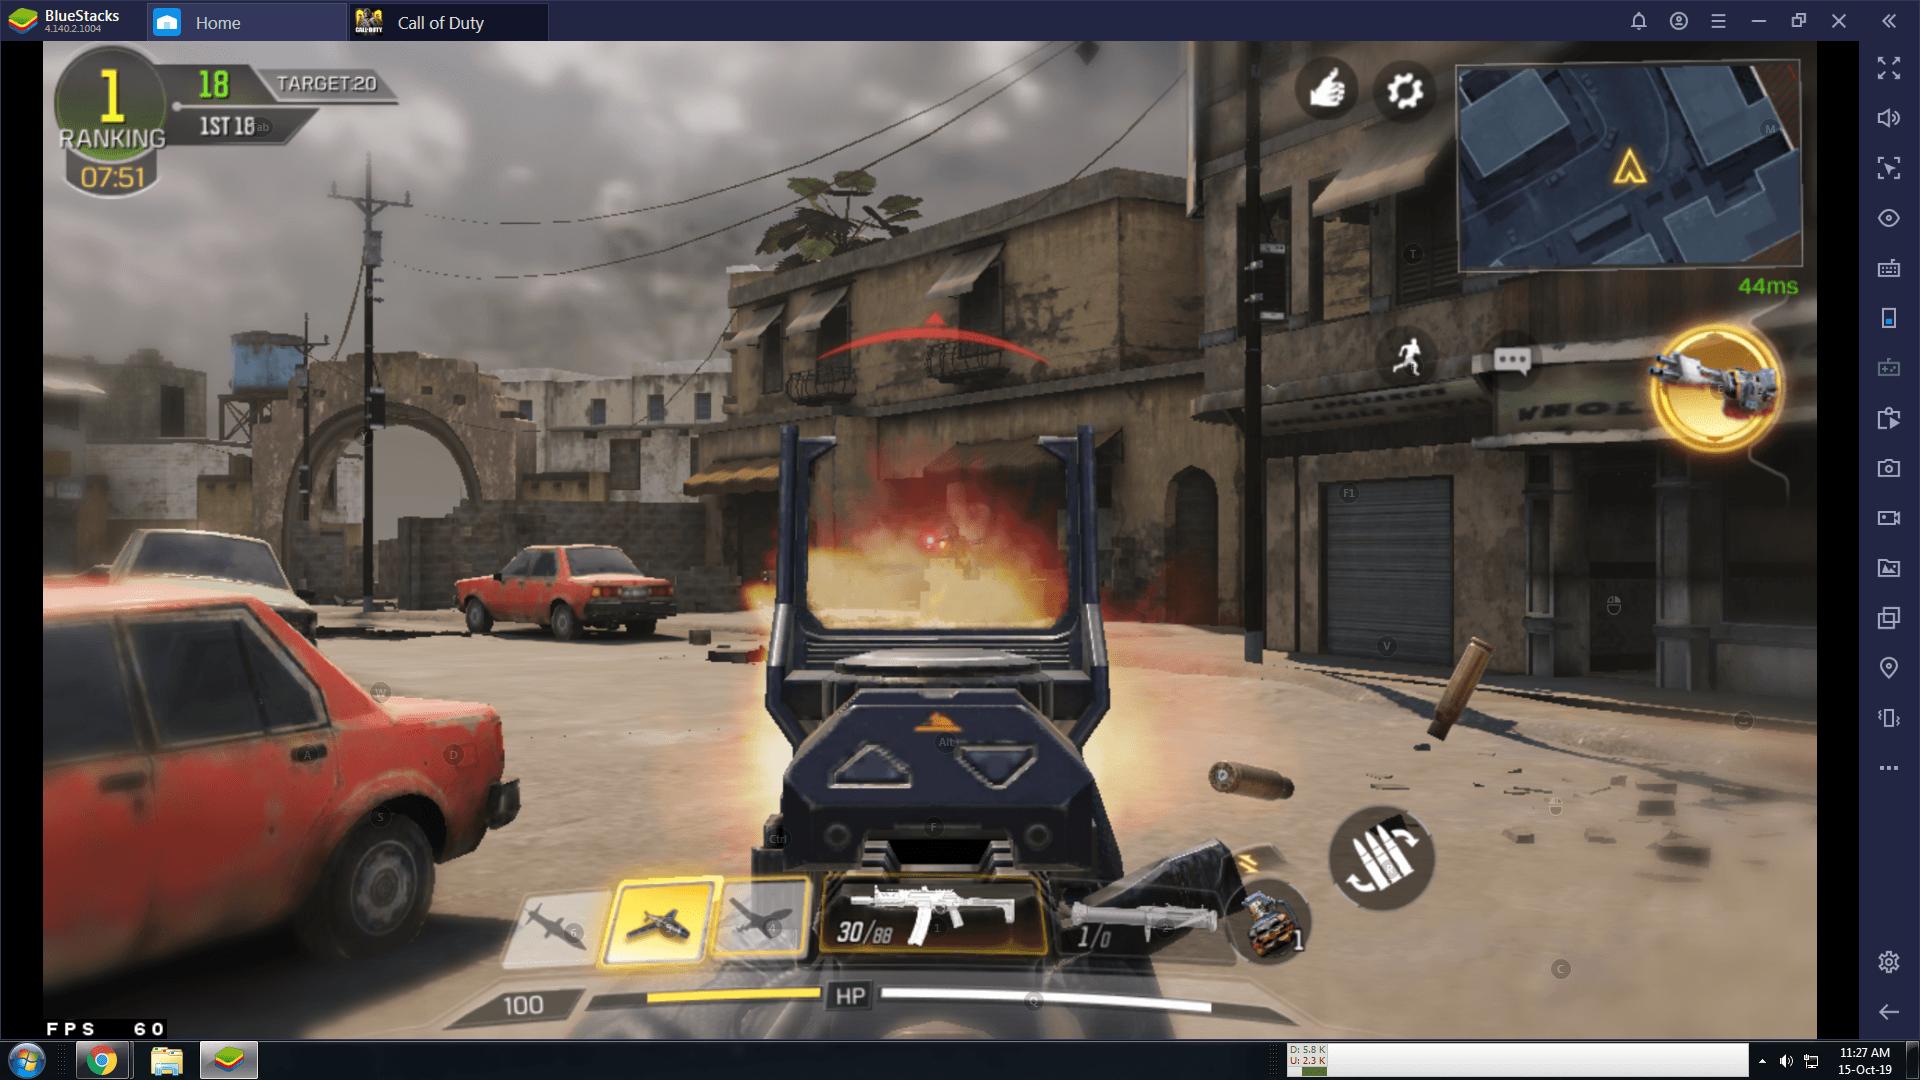 Call of Duty ADS - autofire